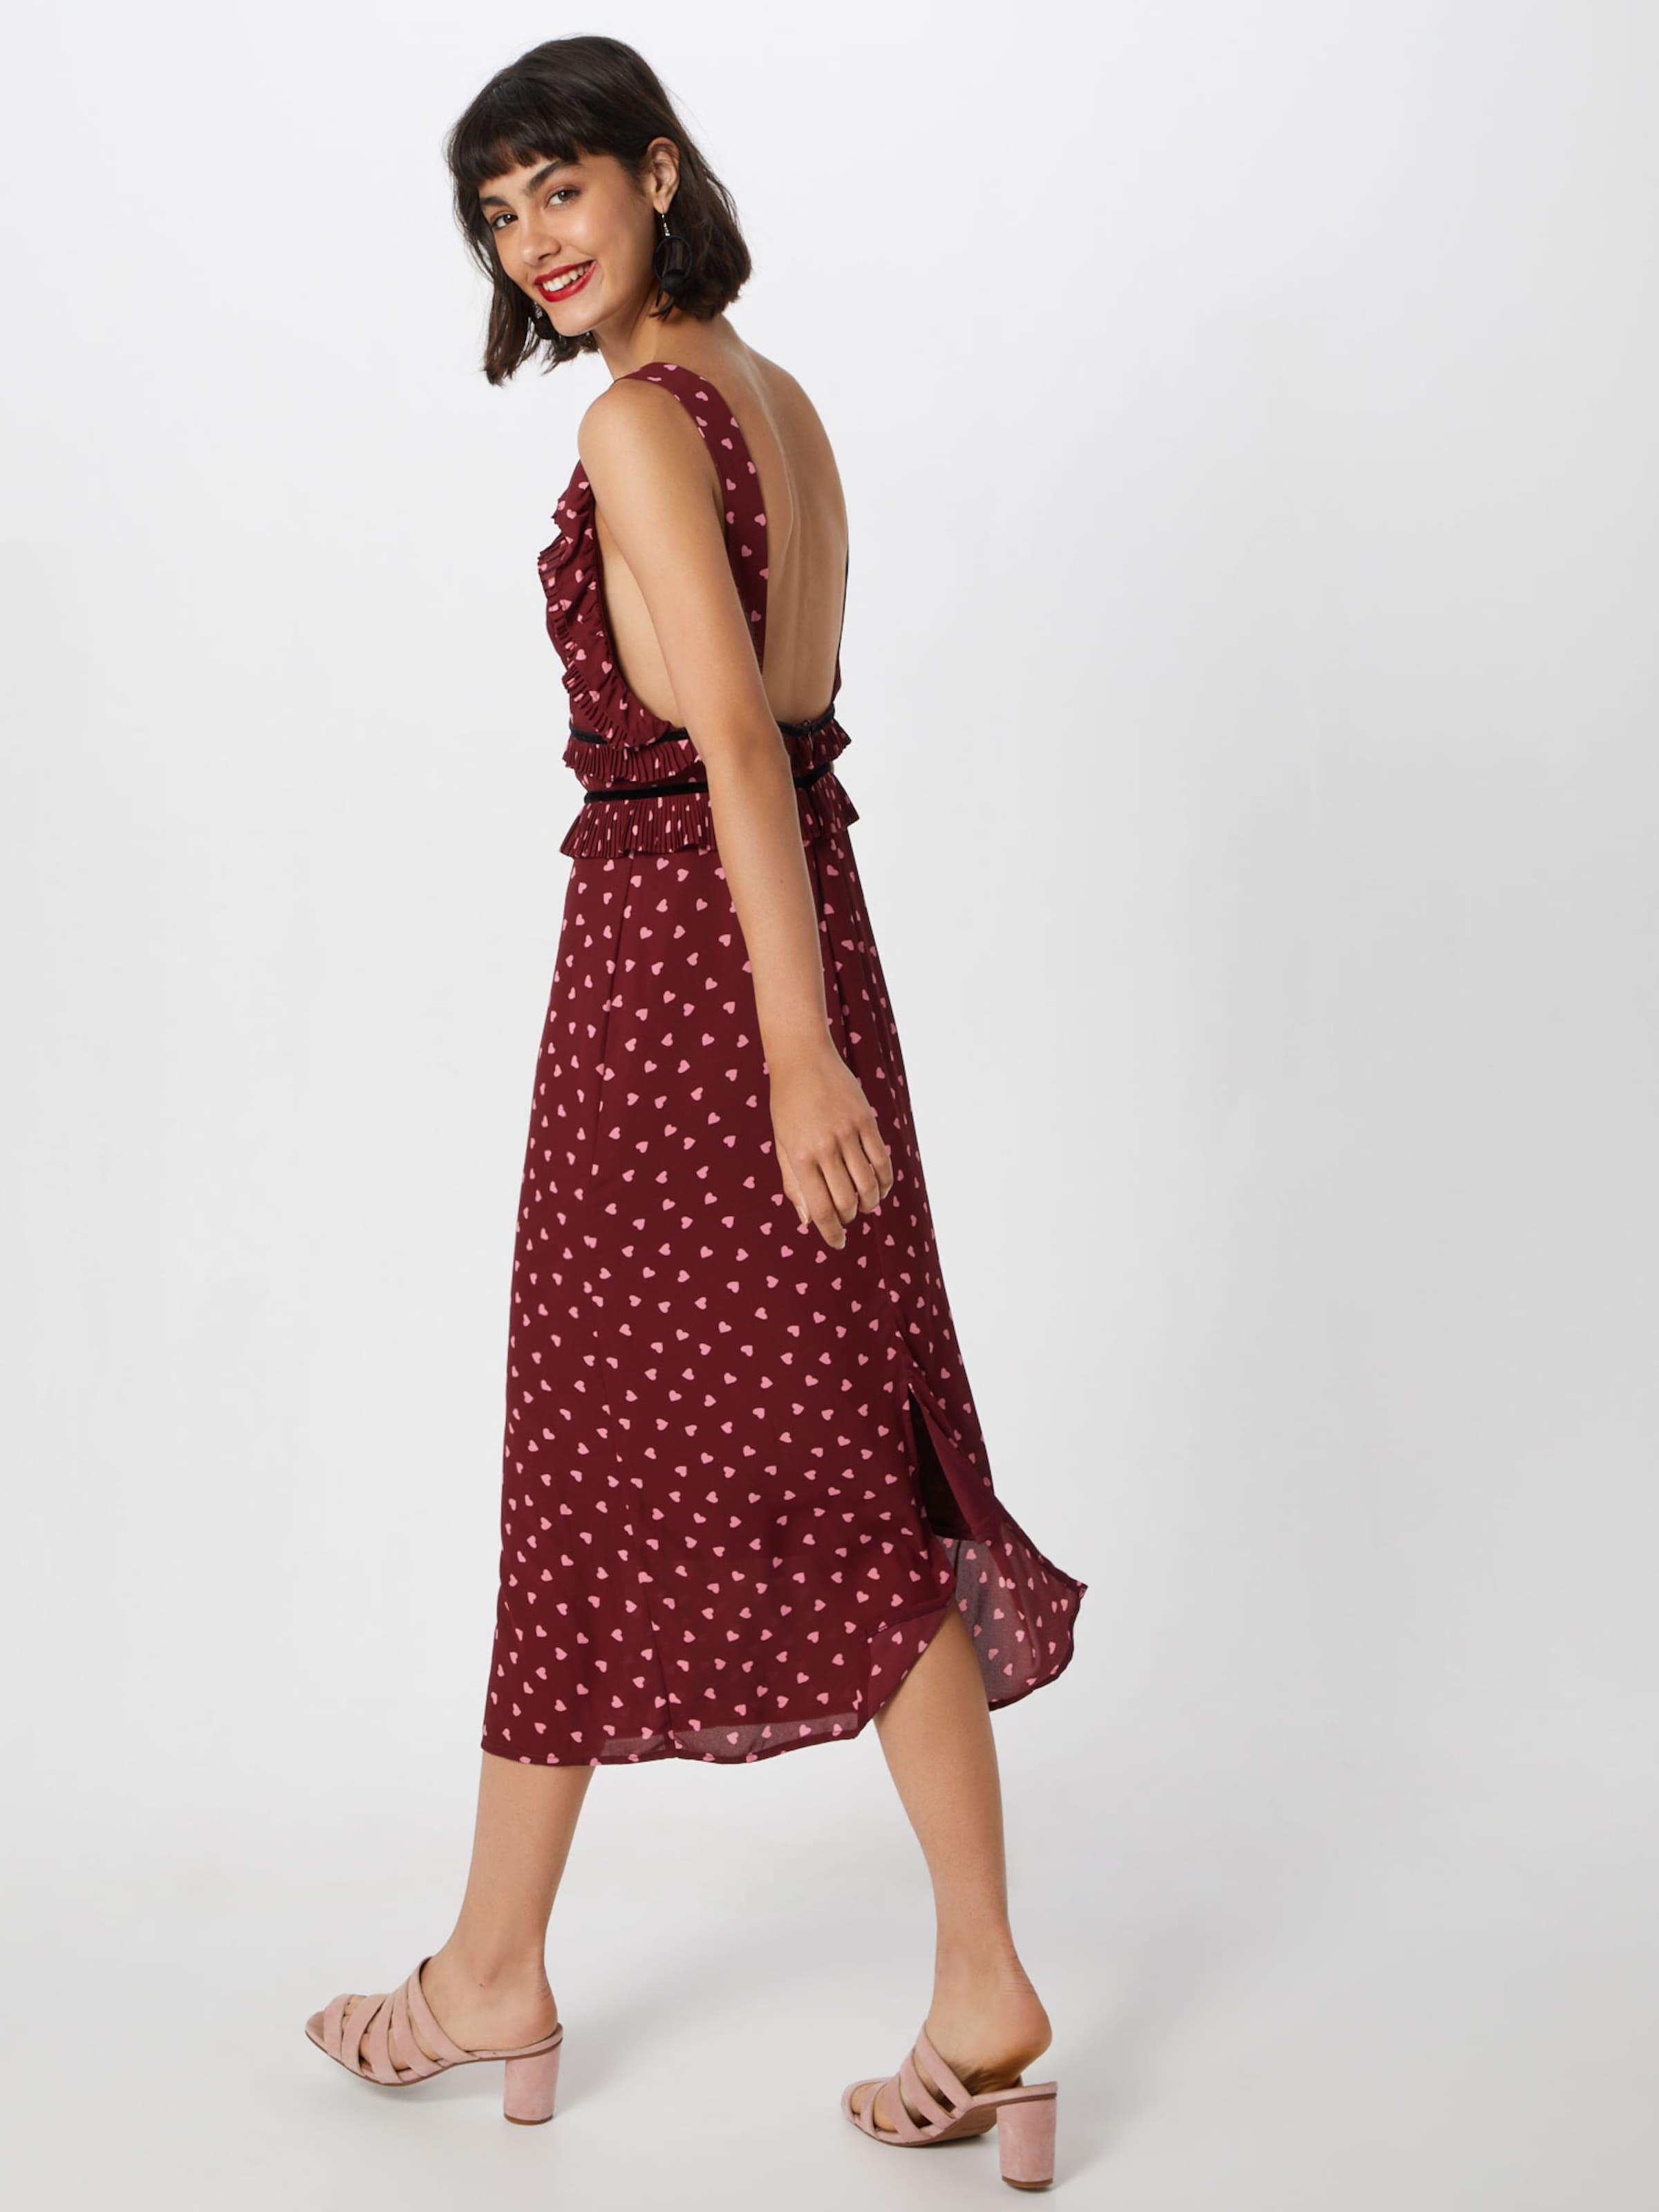 Union Kleid In Fashion RosaBlutrot 'passion' sBQthxrdC